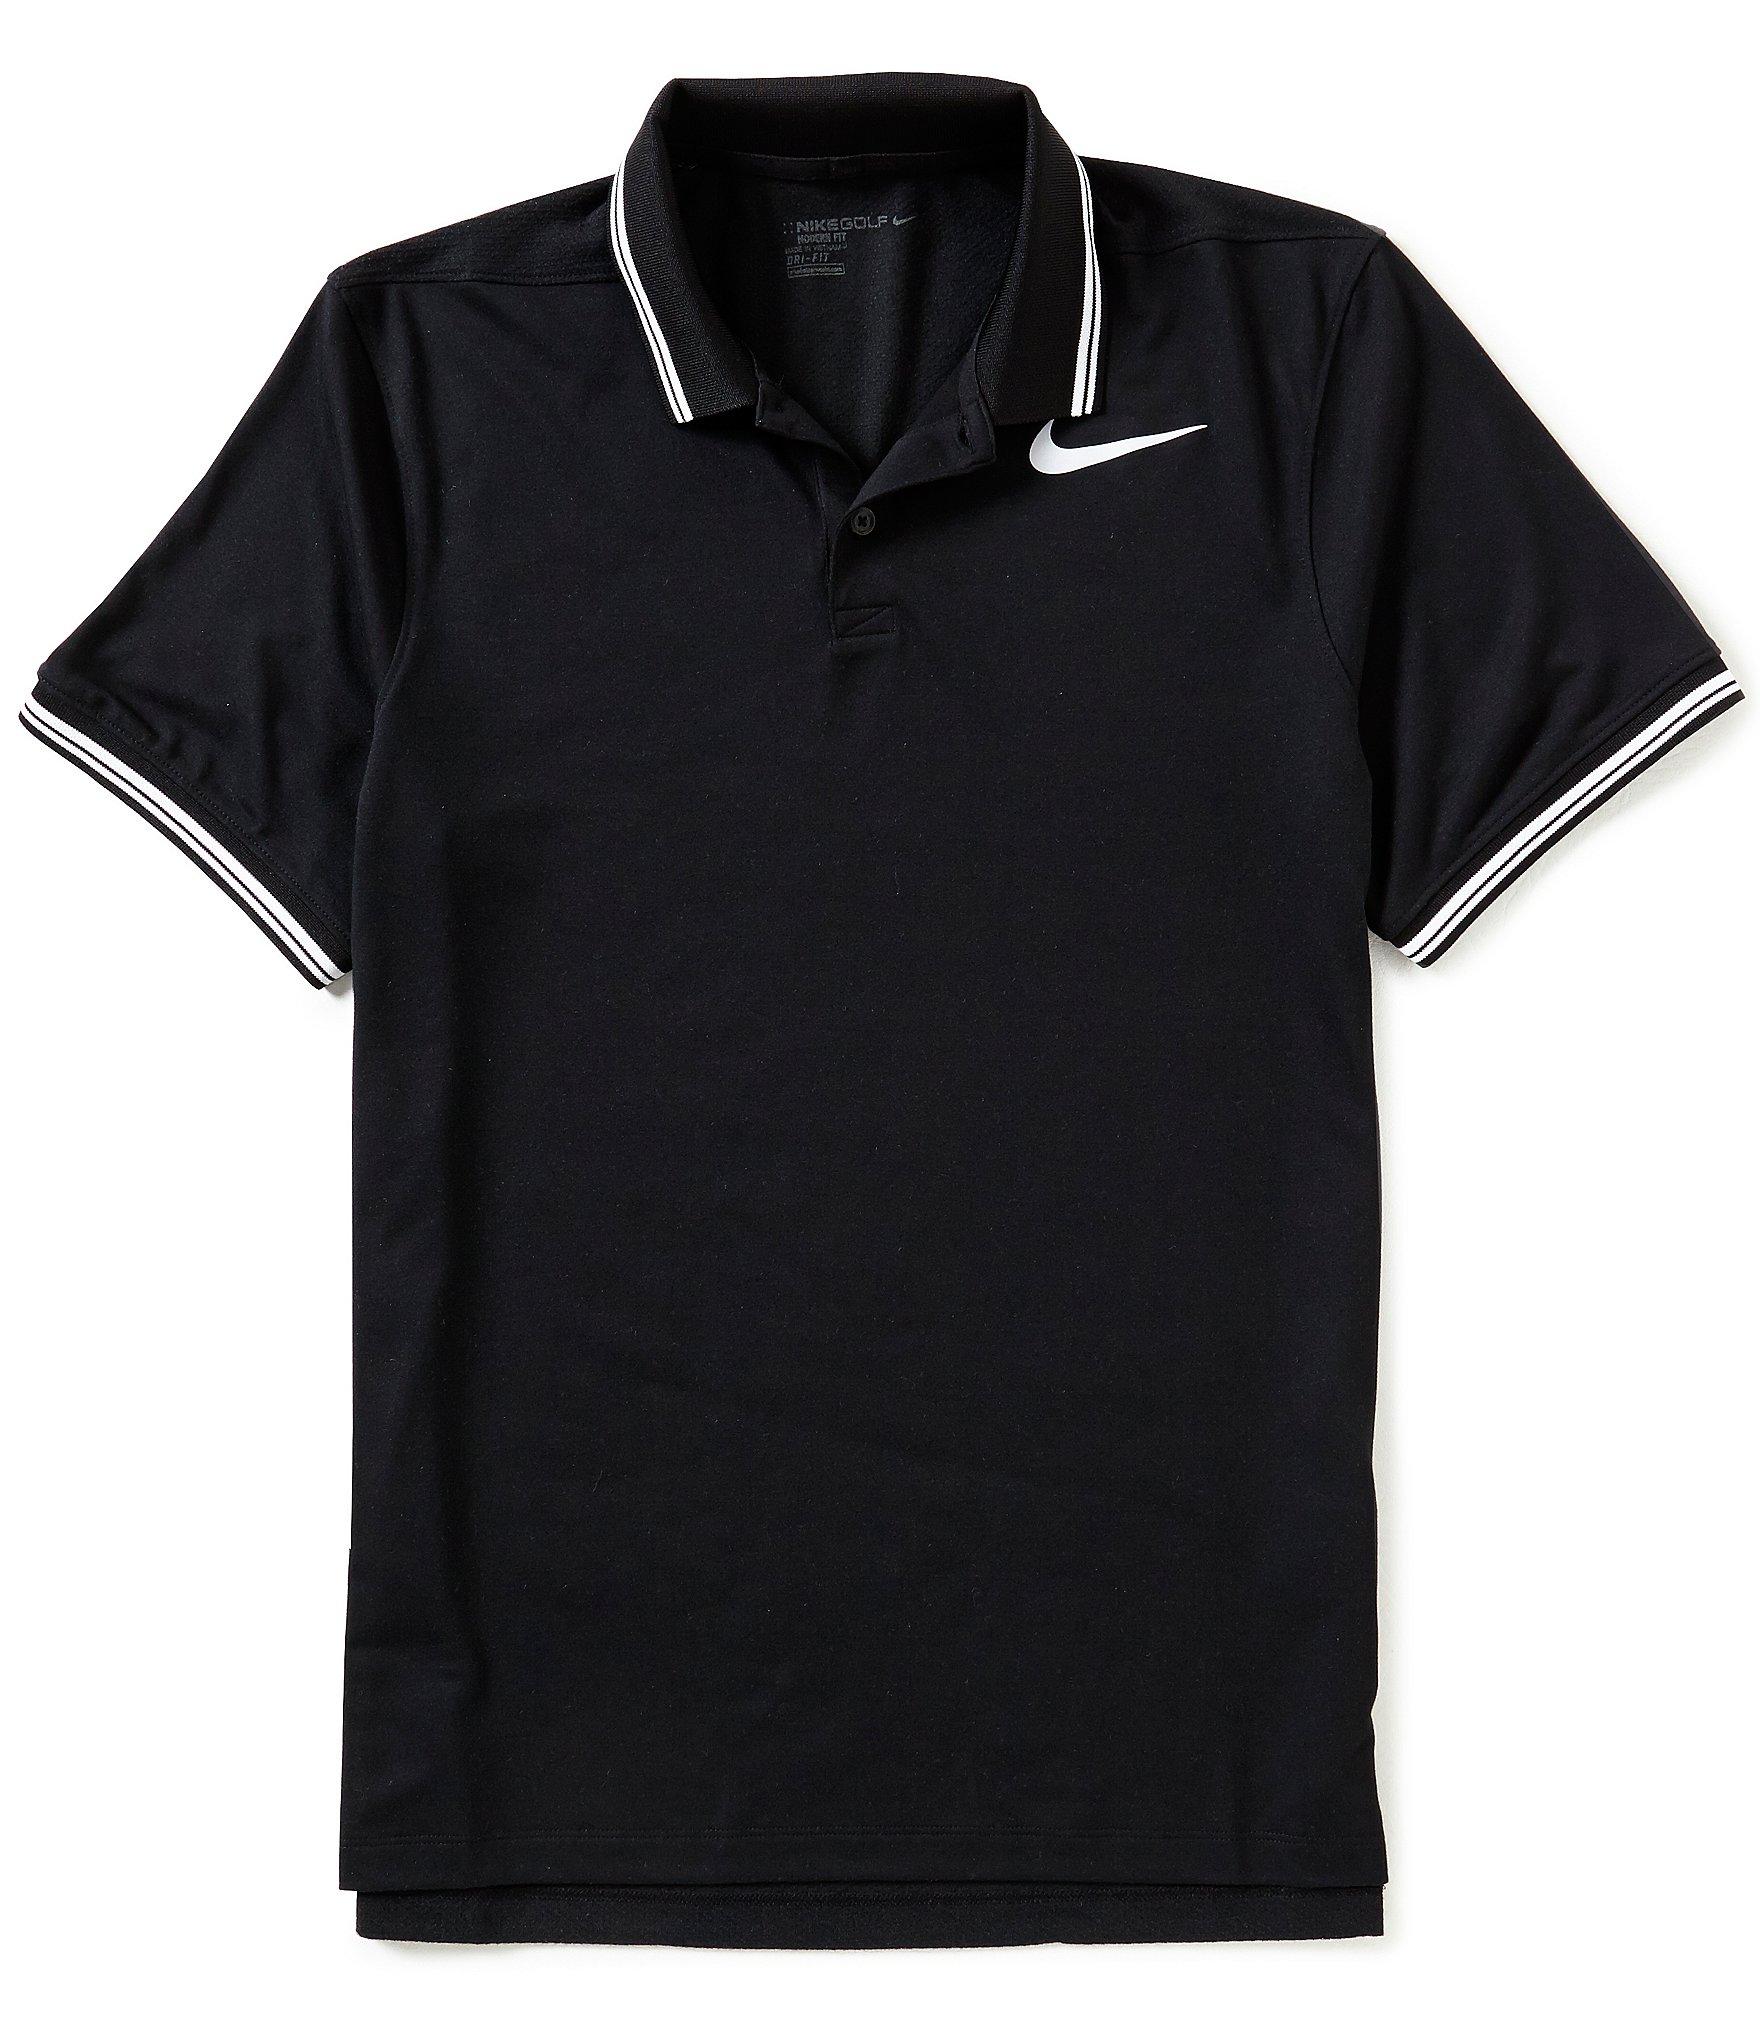 nike golf tipped short sleeve polo shirt dillards